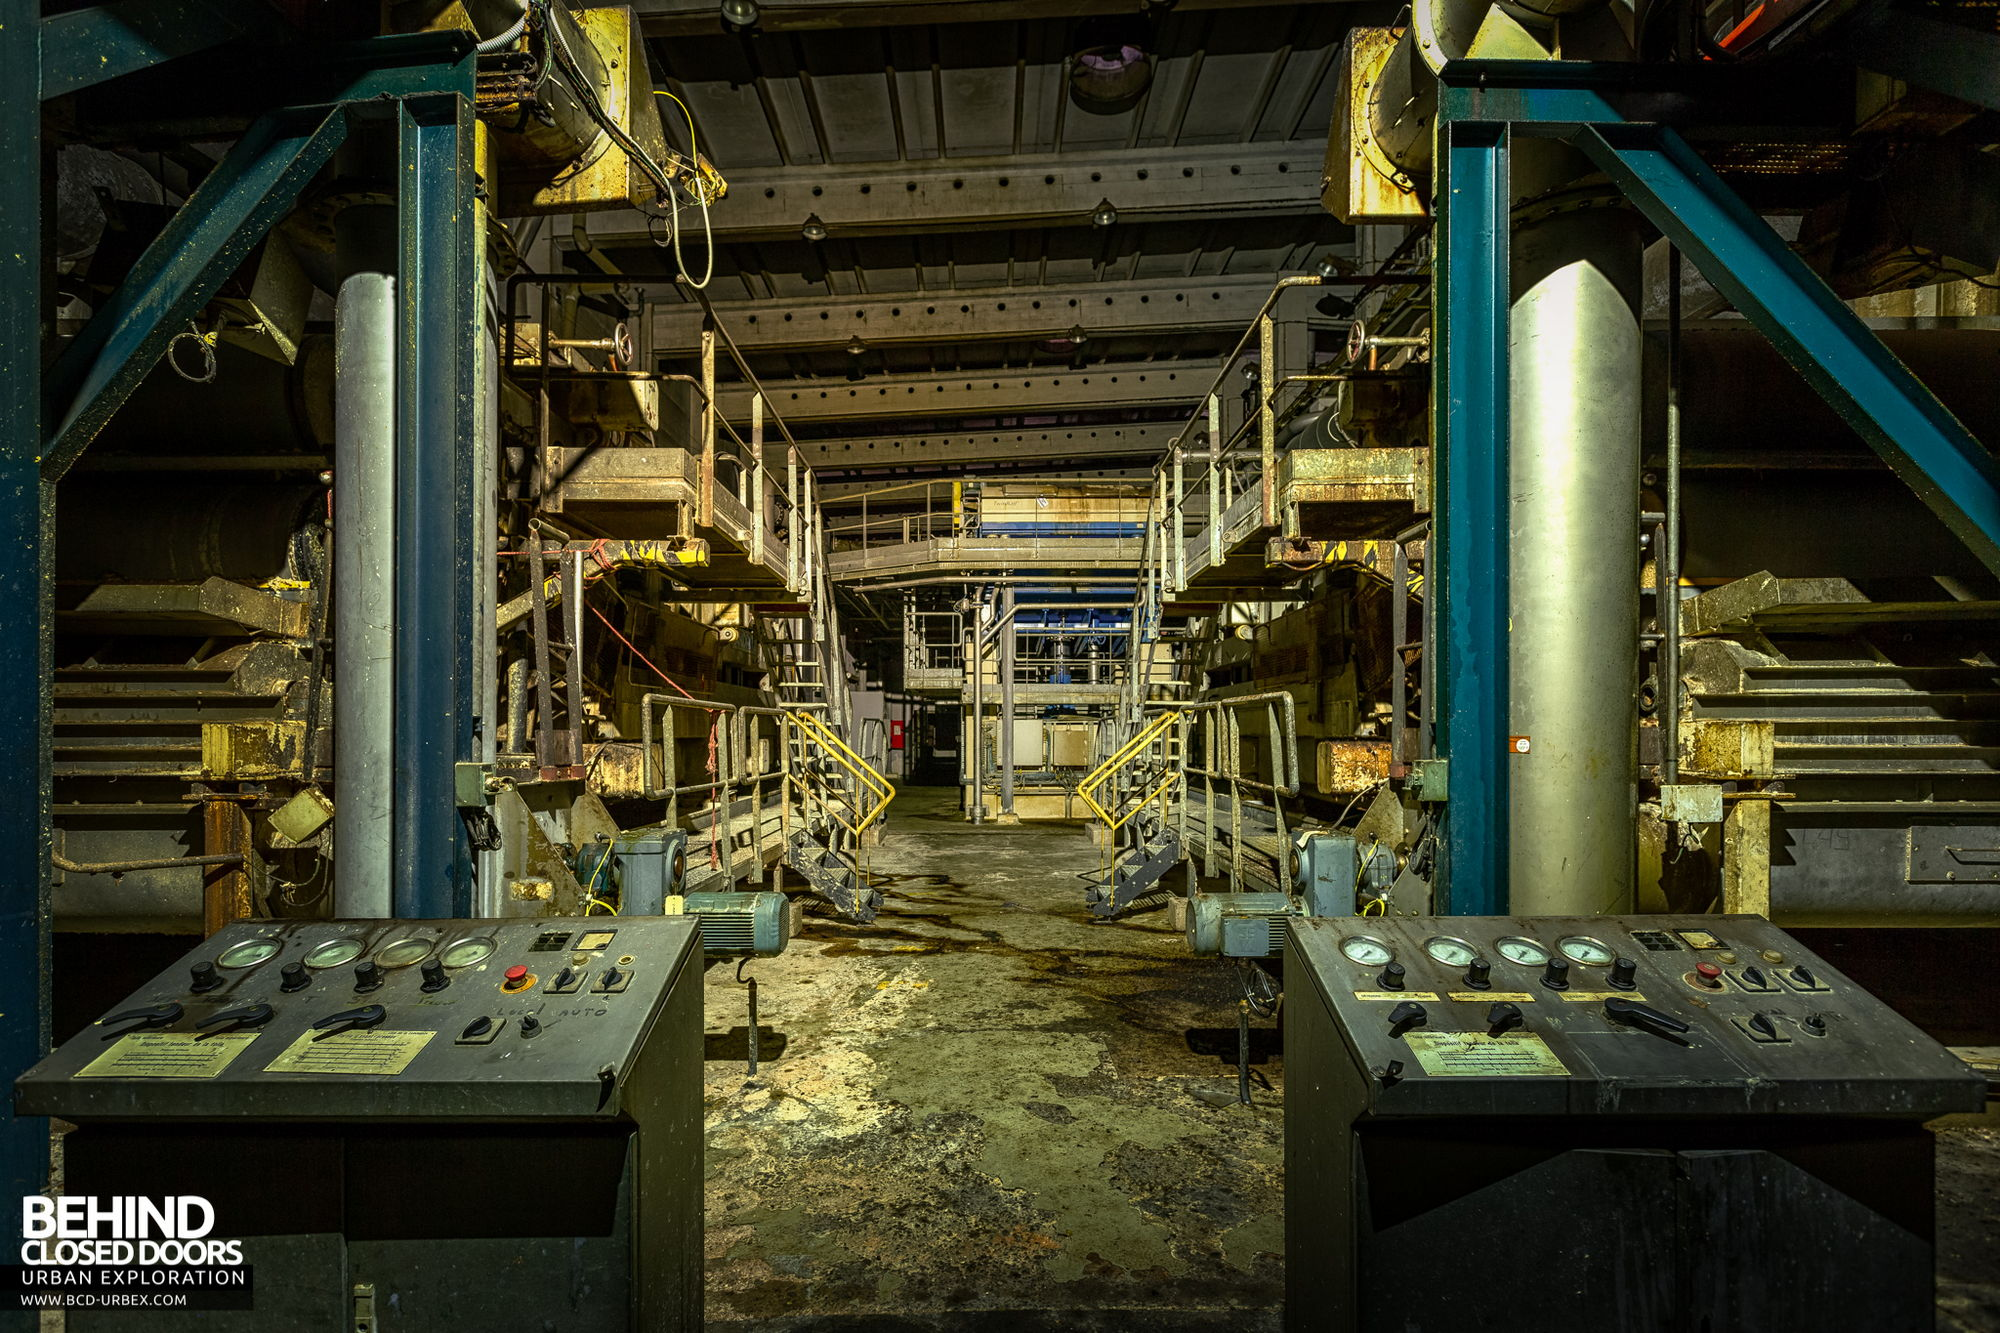 Stora Enso, Corbehem - Twin controls